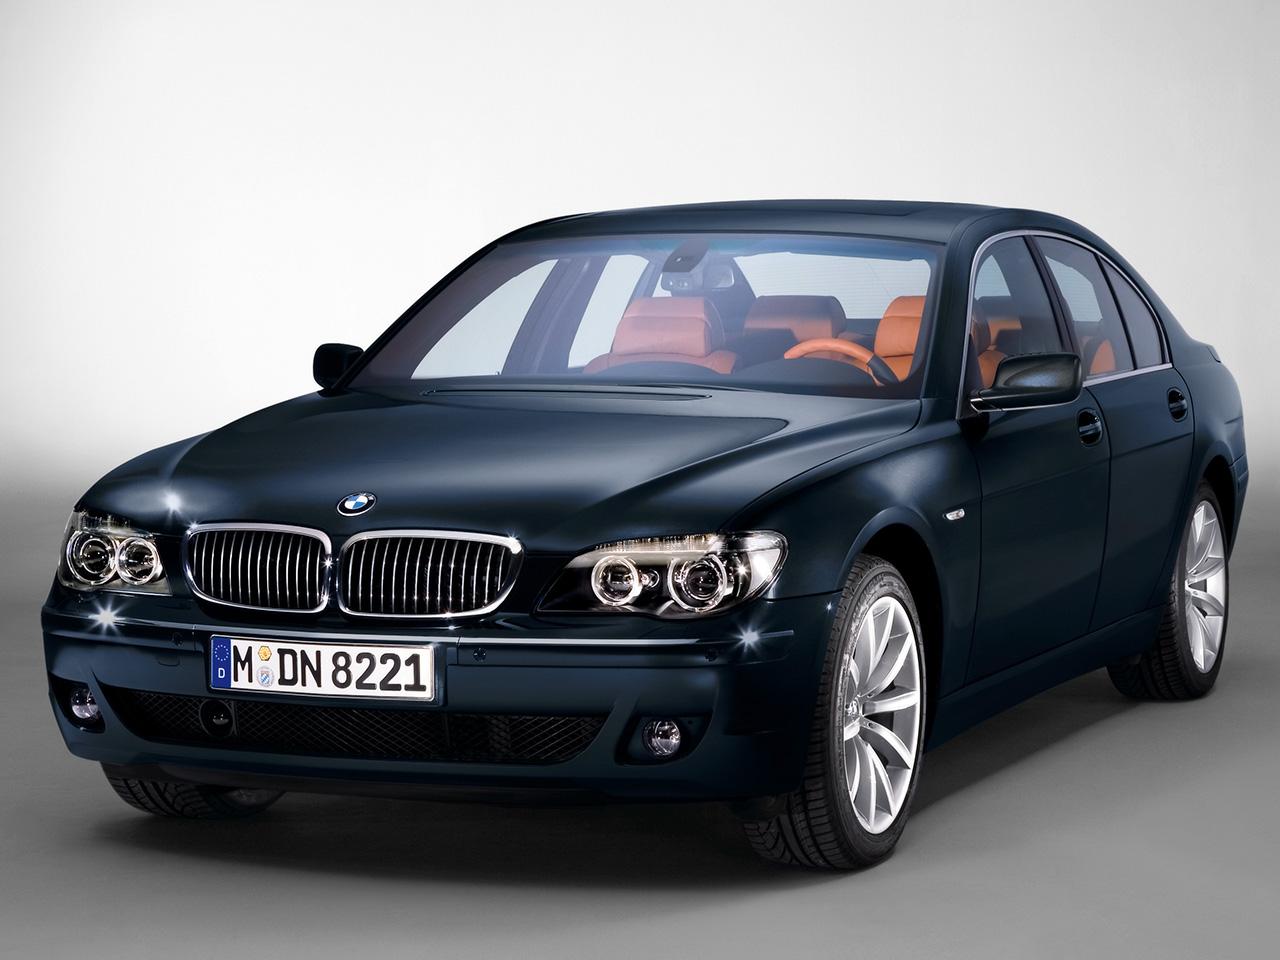 http://3.bp.blogspot.com/-V_HG0uTt5rA/TkGFQSgO6hI/AAAAAAAAKnM/Zr6I4_x_9Z8/s1600/BMW%20HQ%20Wallpaper%20(29).jpg